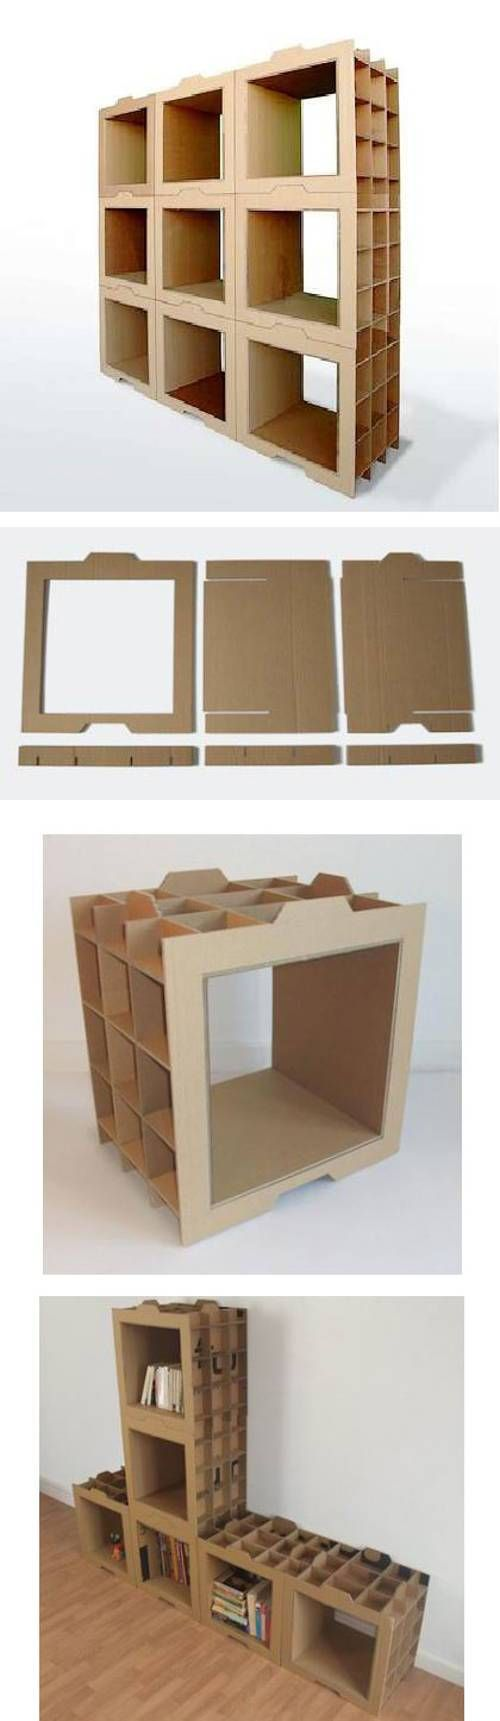 Muebles Hazlo Tu Mismo Reciclaje - Muebles Modulares De Cart N Muebles De Cart N Pinterest [mjhdah]https://i.pinimg.com/originals/6b/a2/18/6ba218e319f9b5a4b840807d5a06aca9.jpg